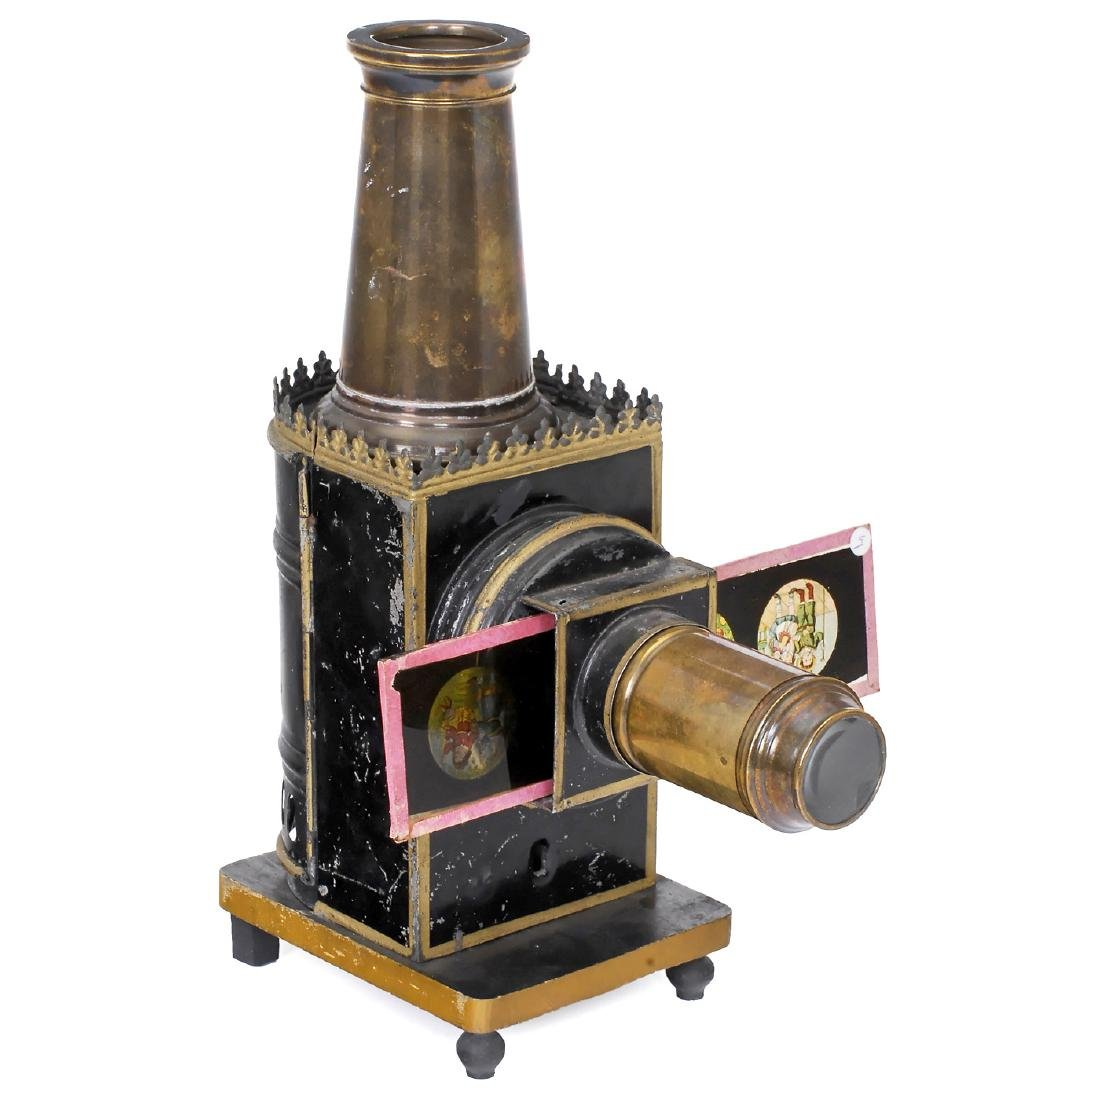 Typ 720 Magic Lantern by Plank, c. 1885